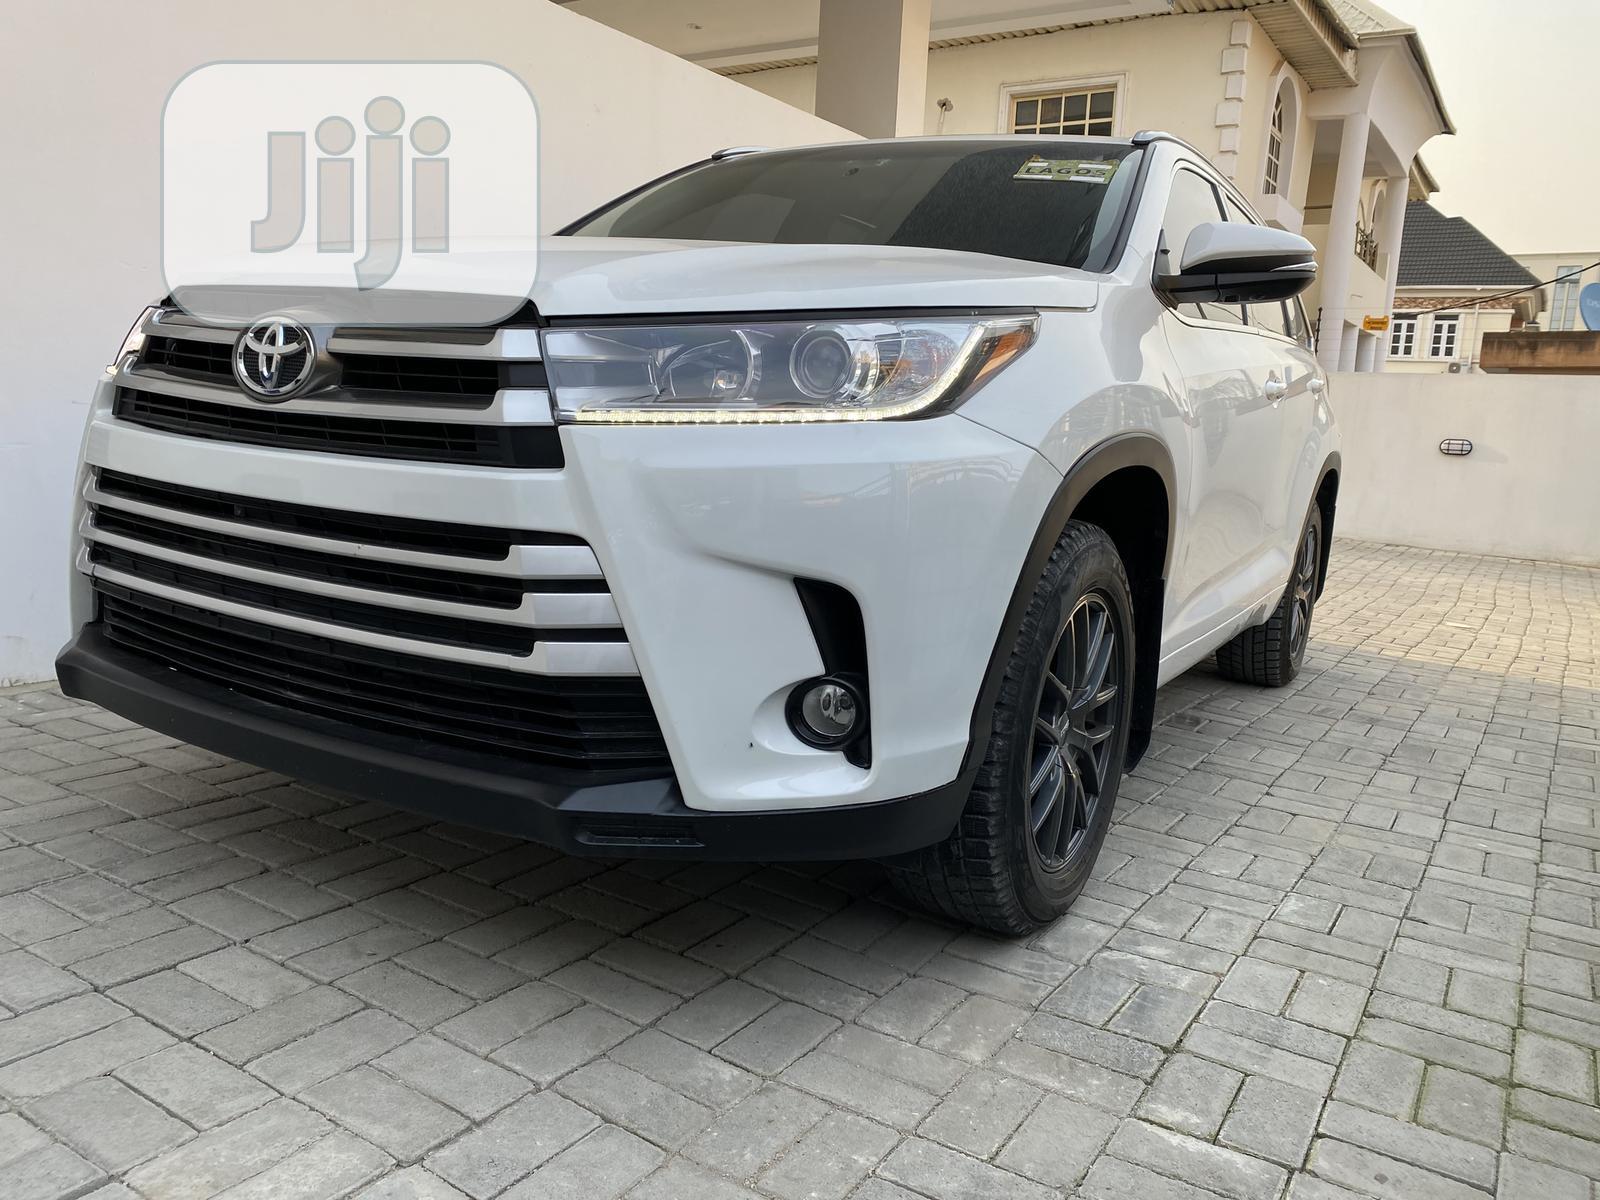 Toyota Highlander 2018 White   Cars for sale in Lekki, Lagos State, Nigeria